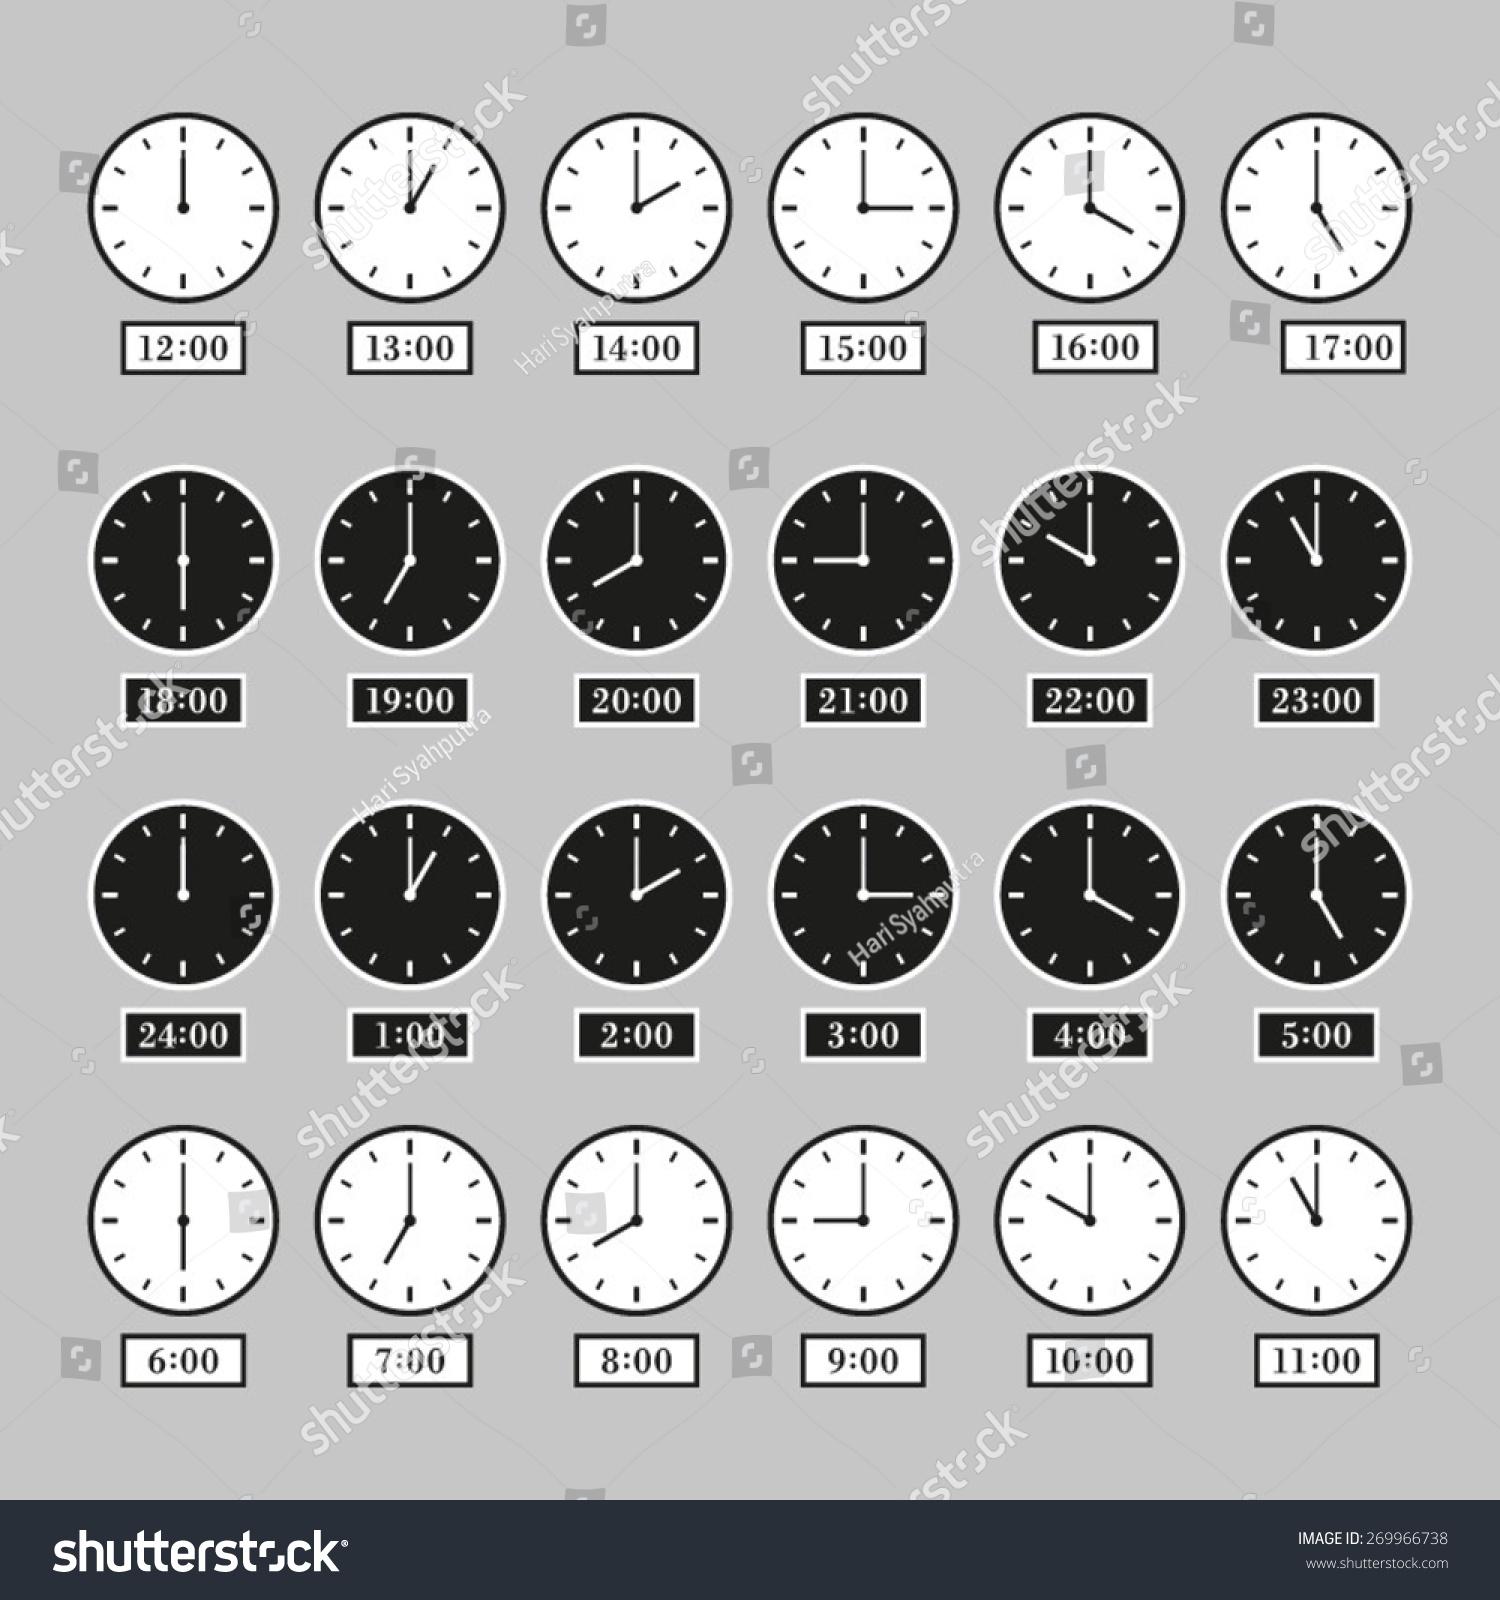 Vector Analog Clock 24 Hours Day Stock Vector 269966738 - Shutterstock